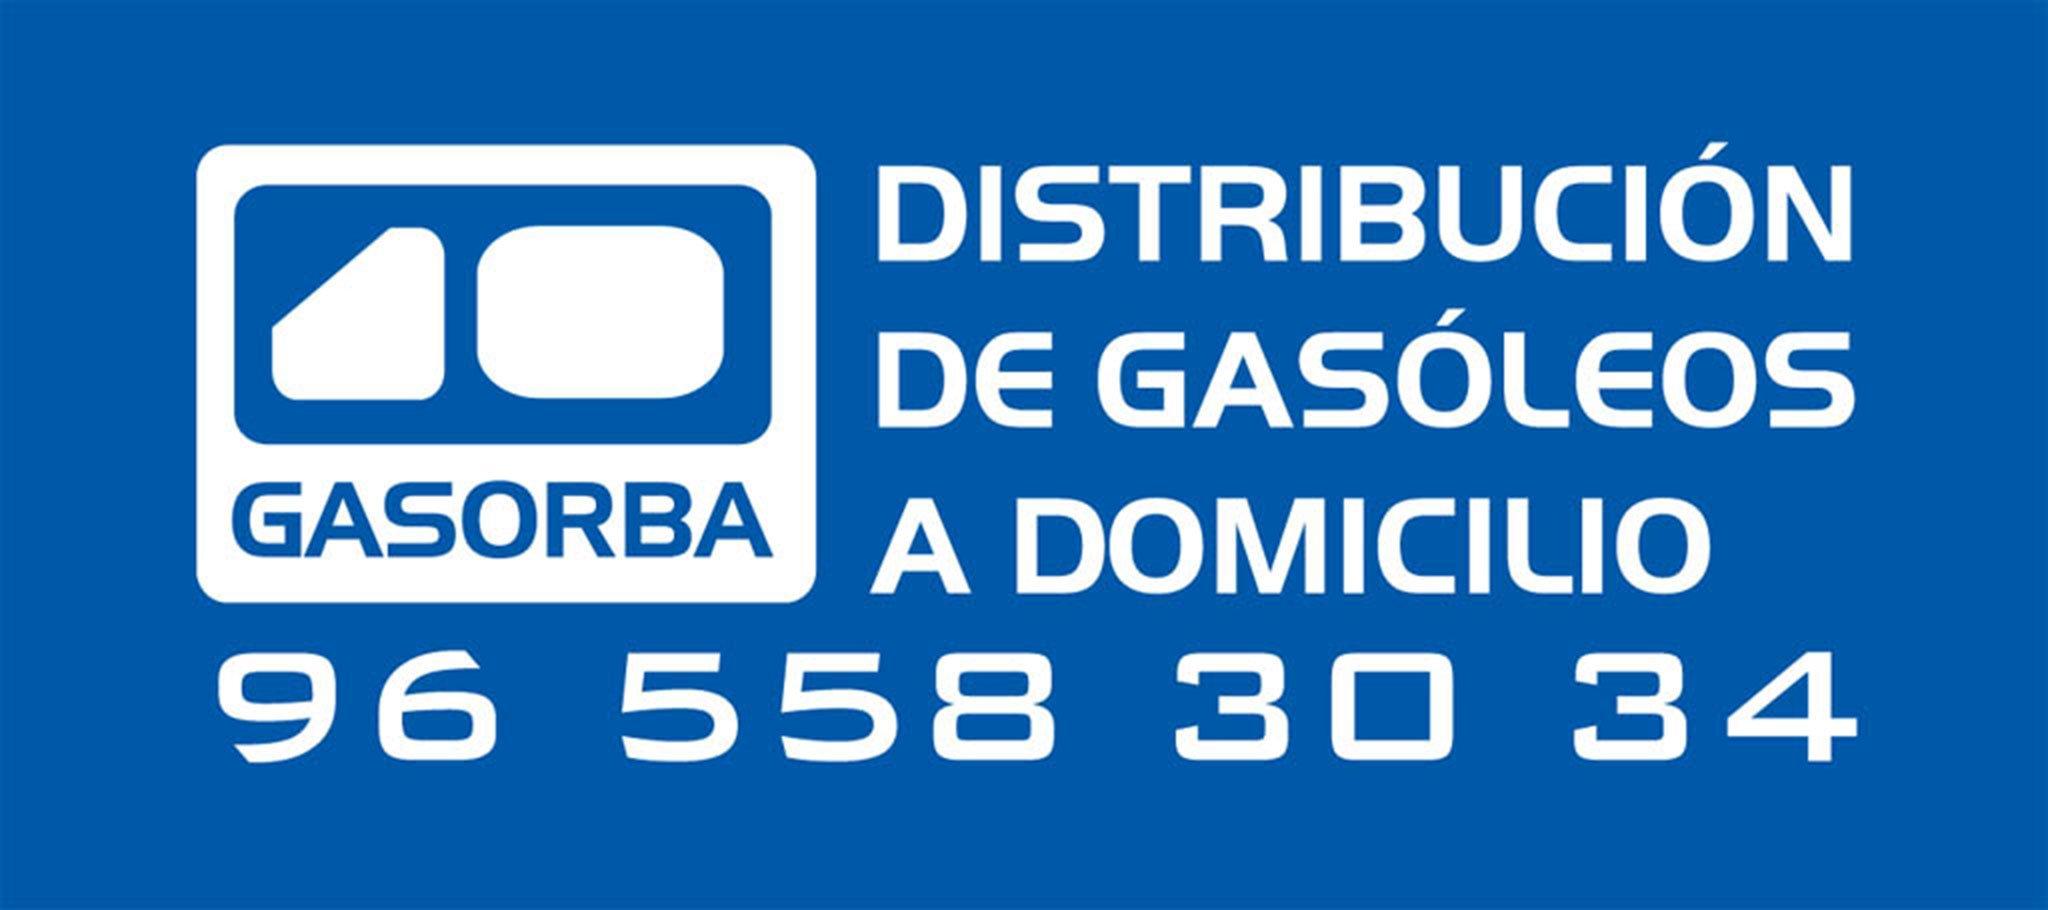 Logotip de Gasorba